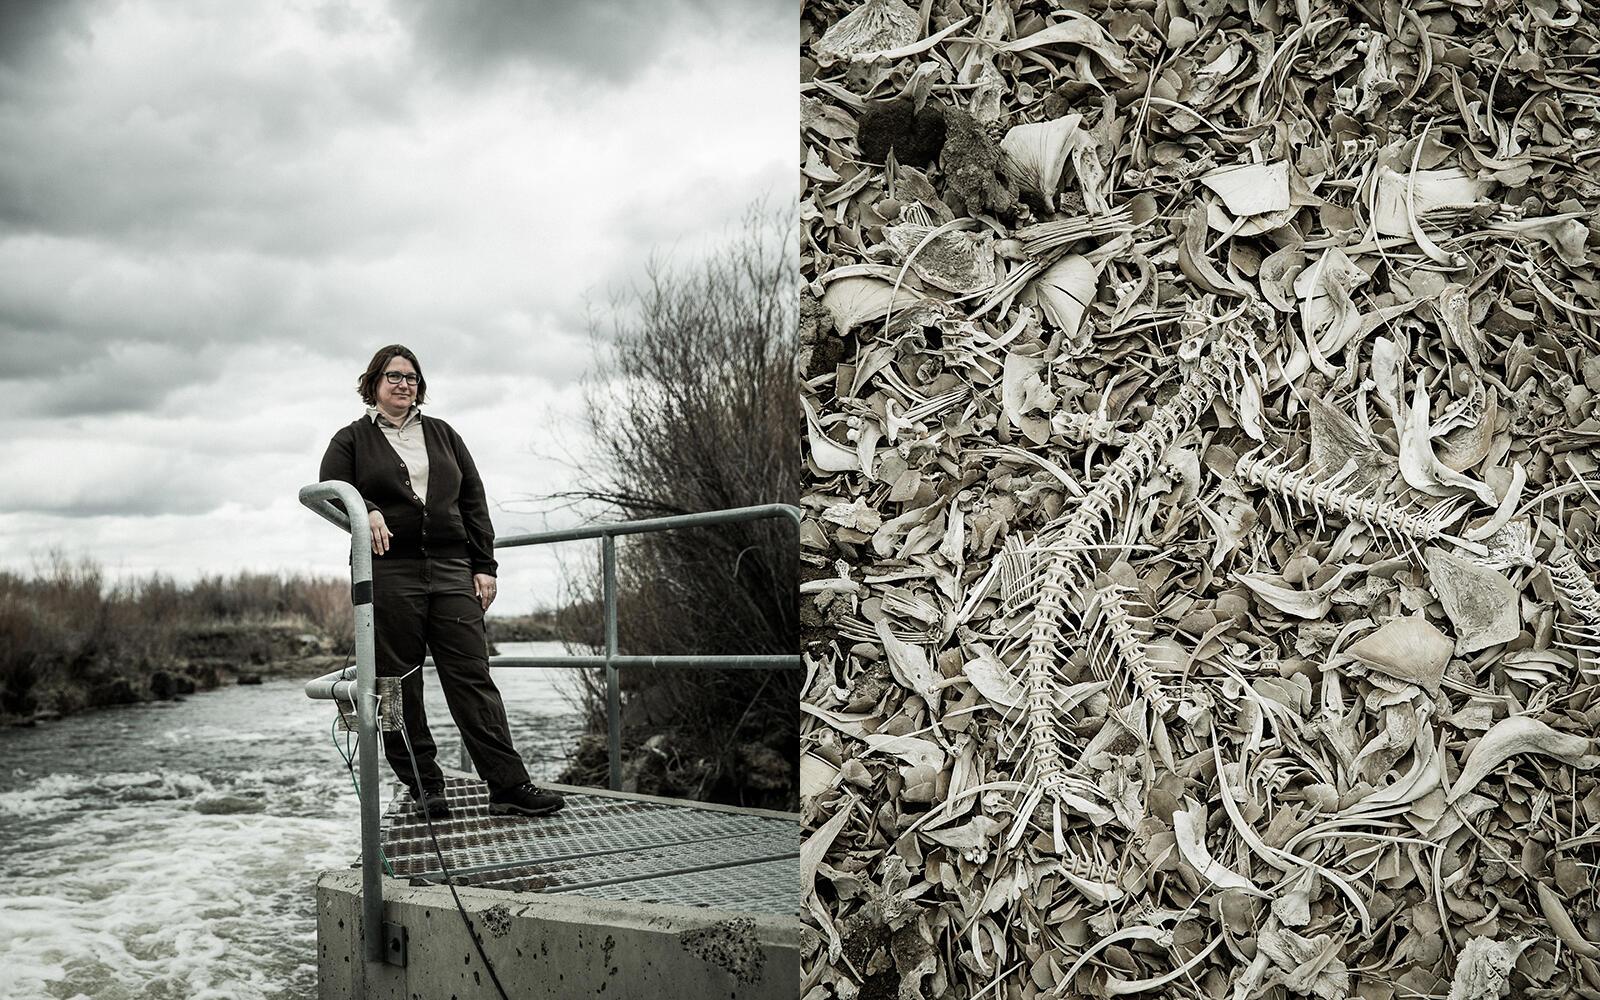 Linda Beck, fish biologist, photographed at a fish trap on the Blitzen river south of Lake Malheur, Malheur National Wildlife Refuge. John Clark